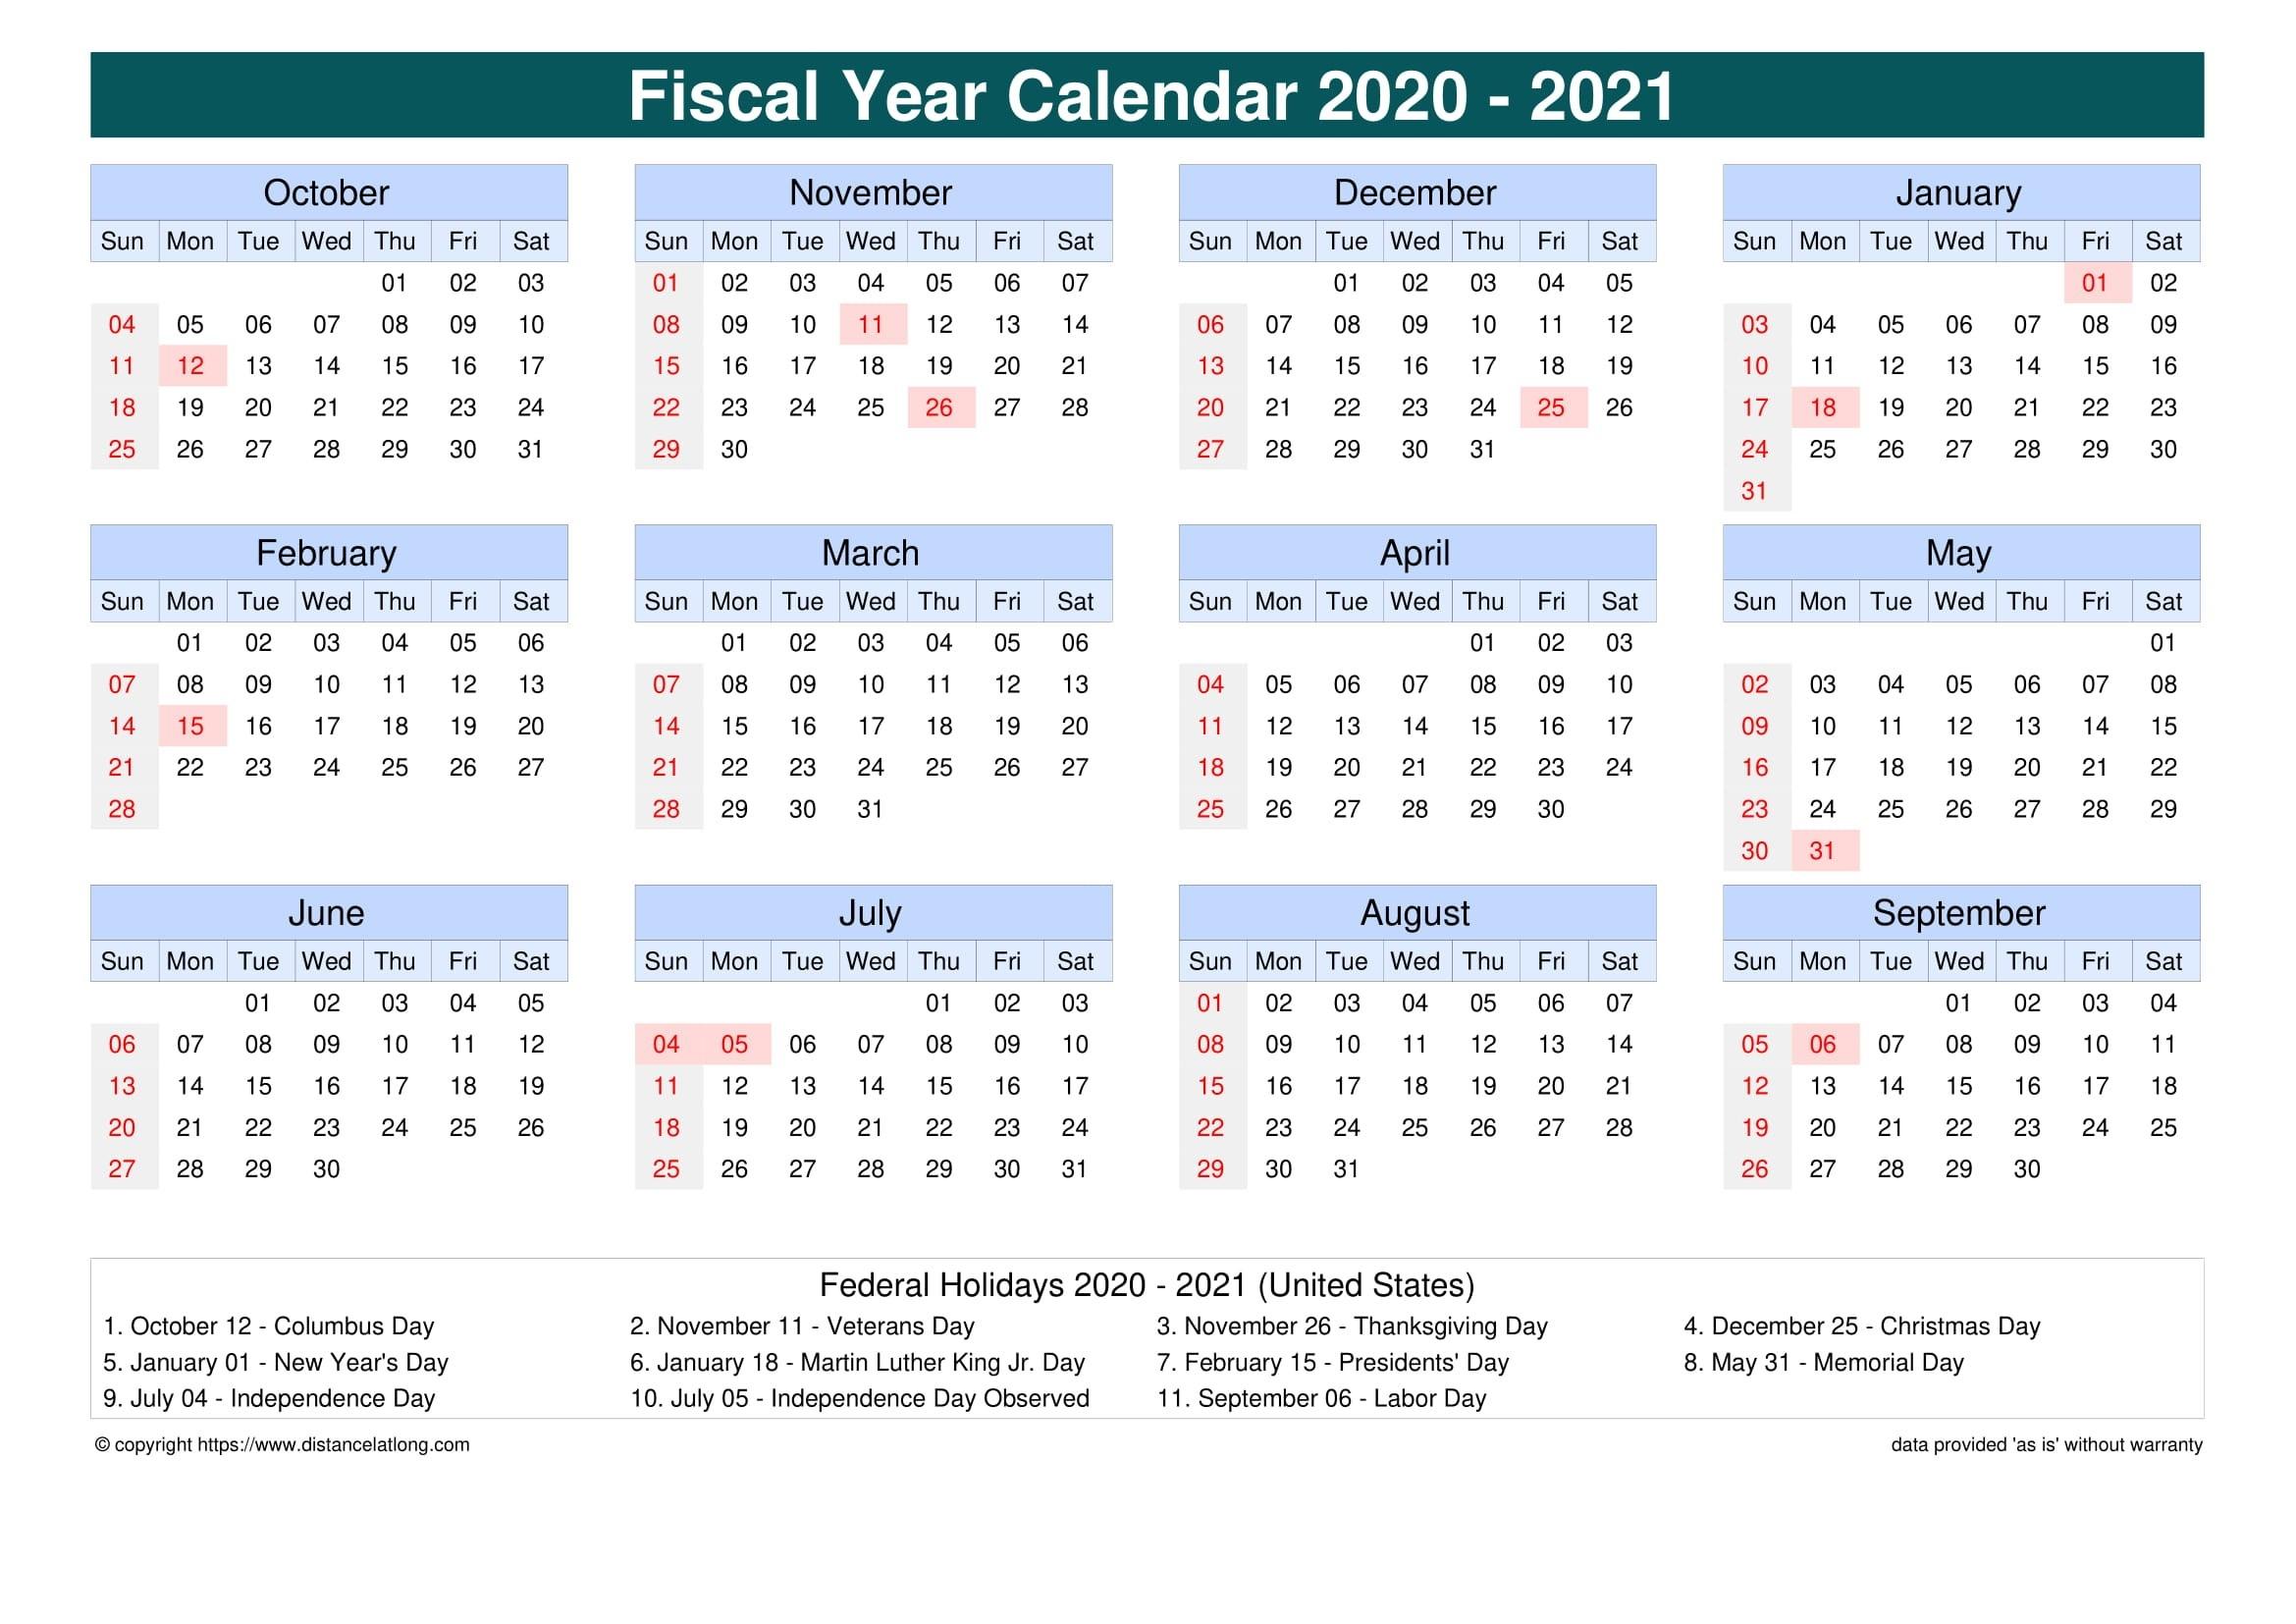 Fiscal Year 2020-2021 Calendar Templates, Free Printable  2021/2021 Financial Calendar Pdf